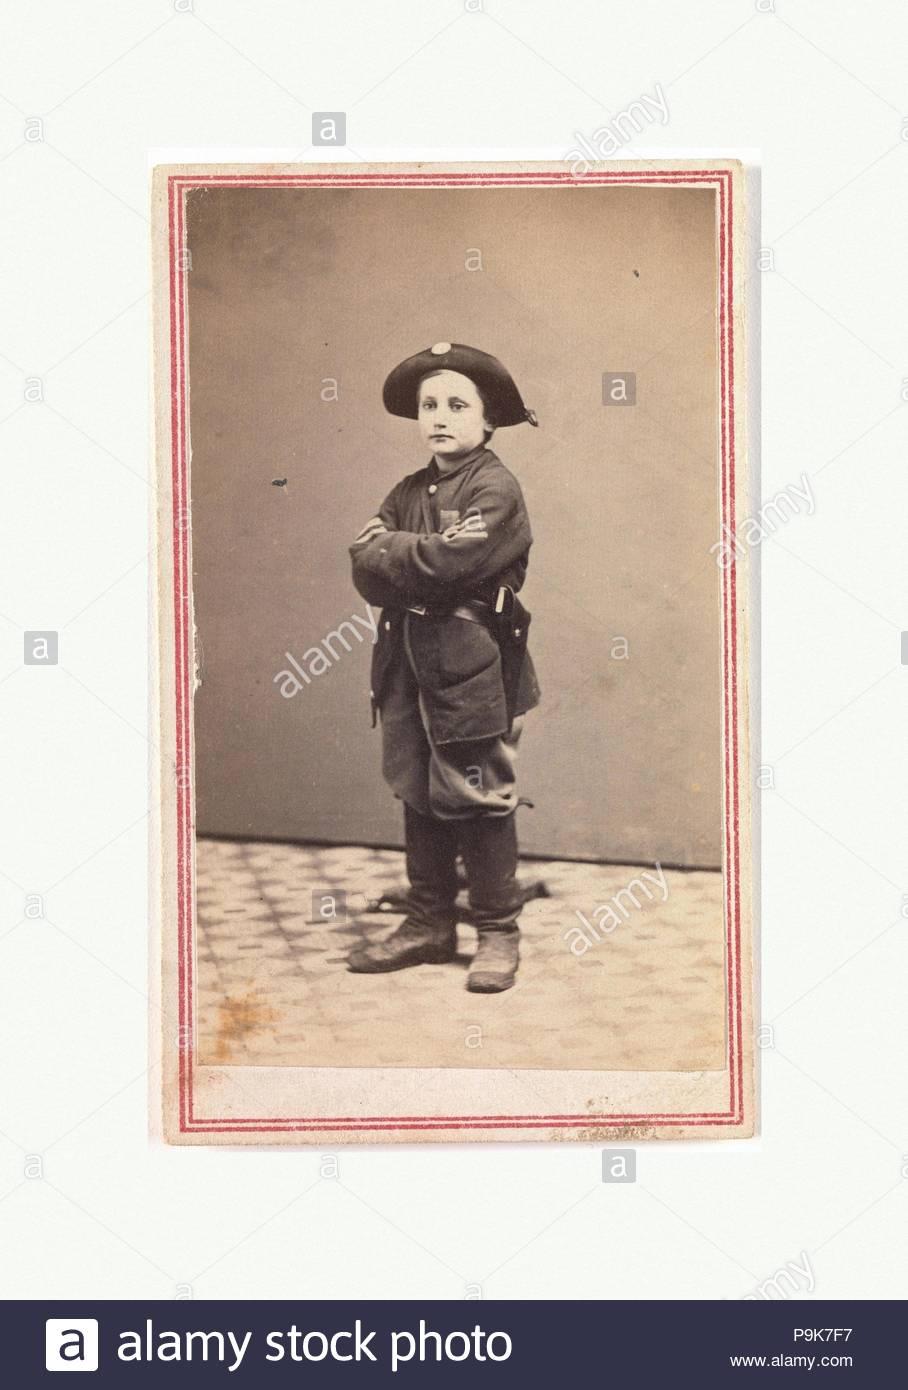 Sergeant John Lincoln Clem The Drummer Boy Of Chickamauga Ca 1864 Albumen